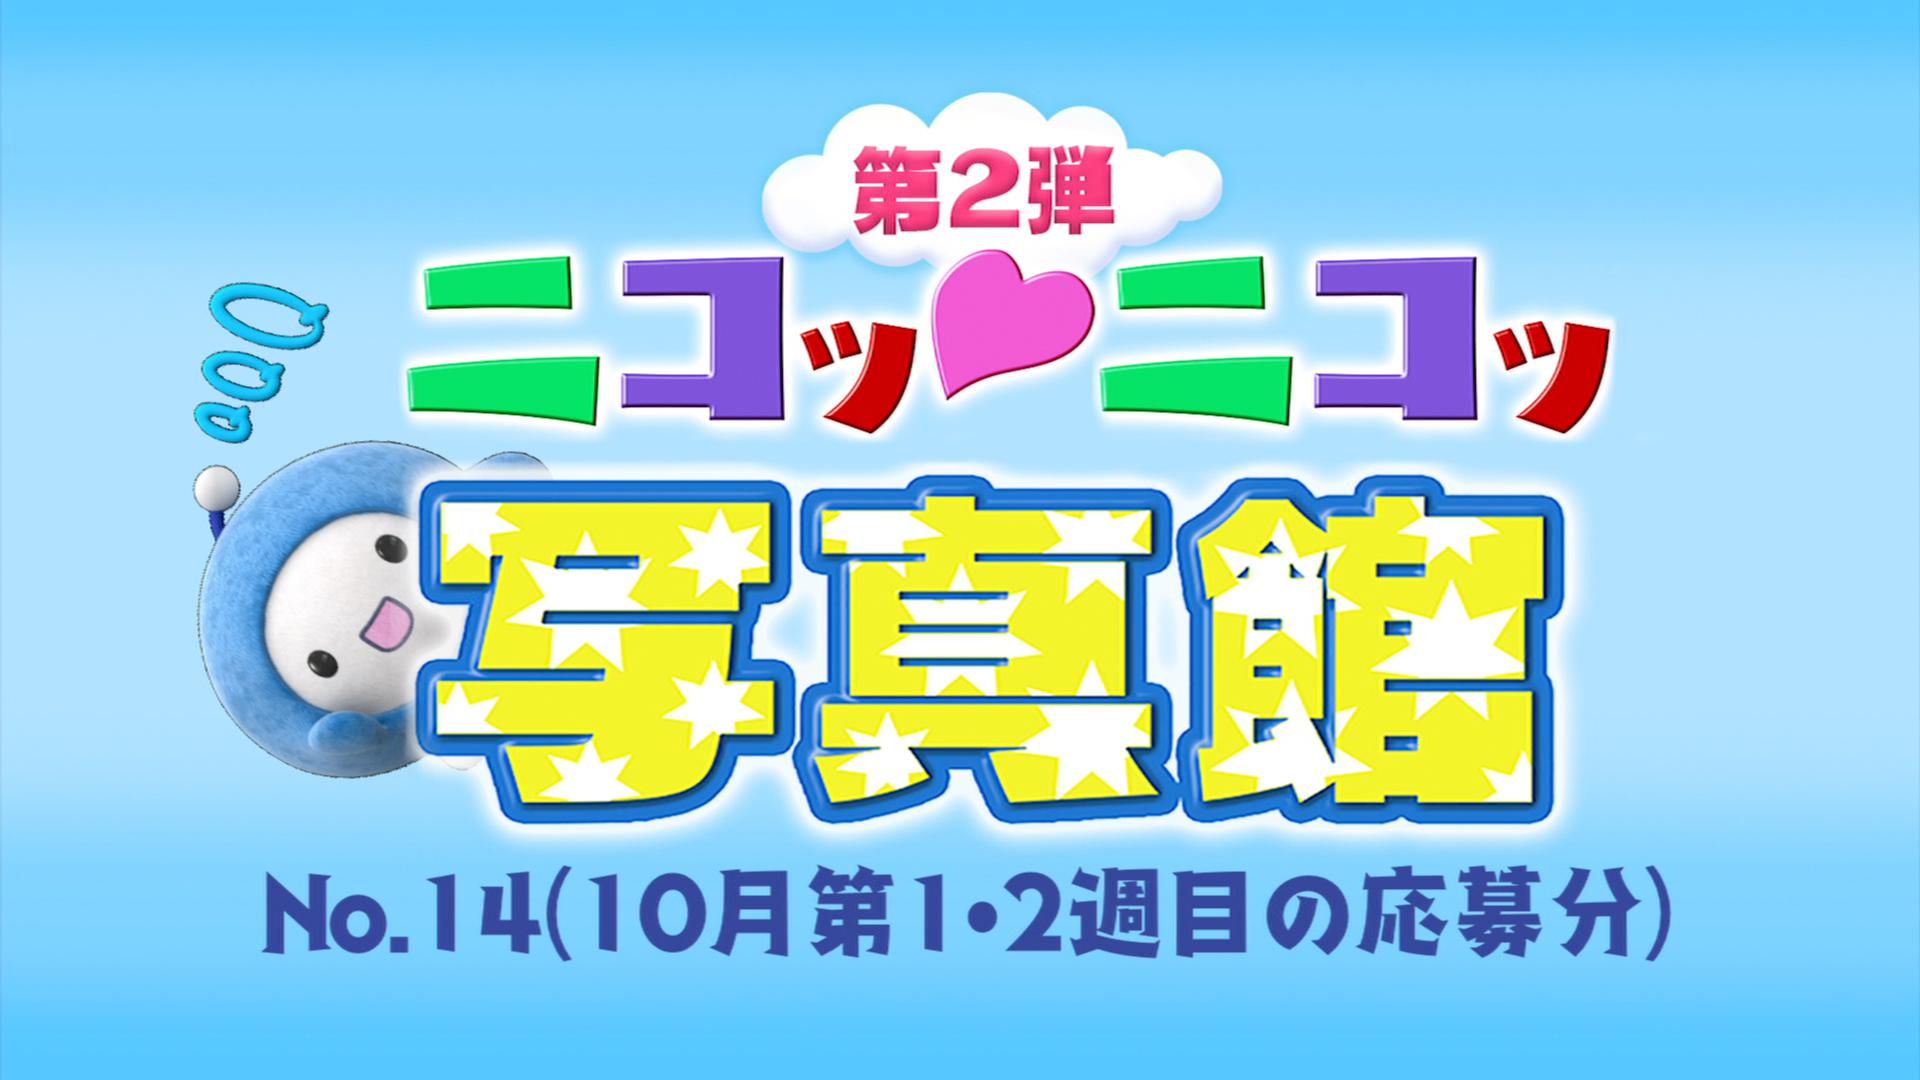 No.14「10月第1週・2週の応募分」